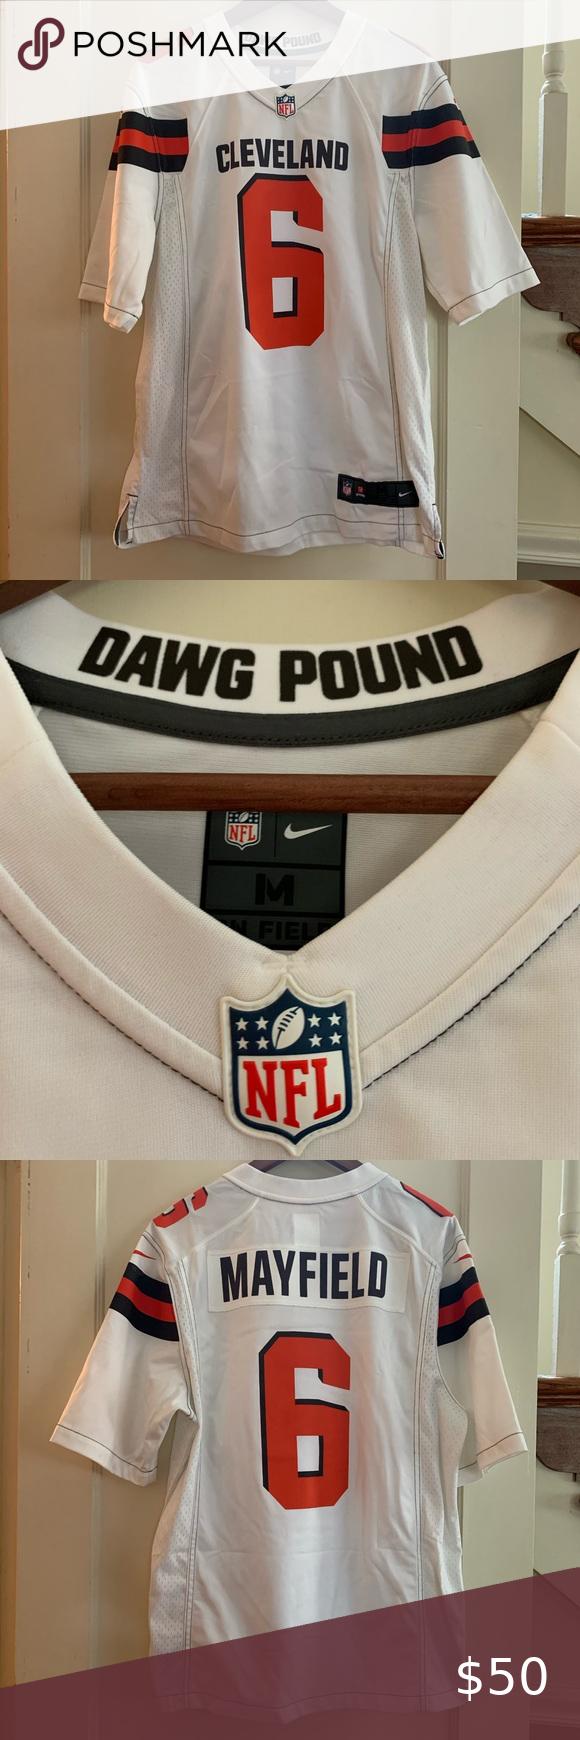 Baker Mayfield NFL Shop Nike White Jersey in 2020 White